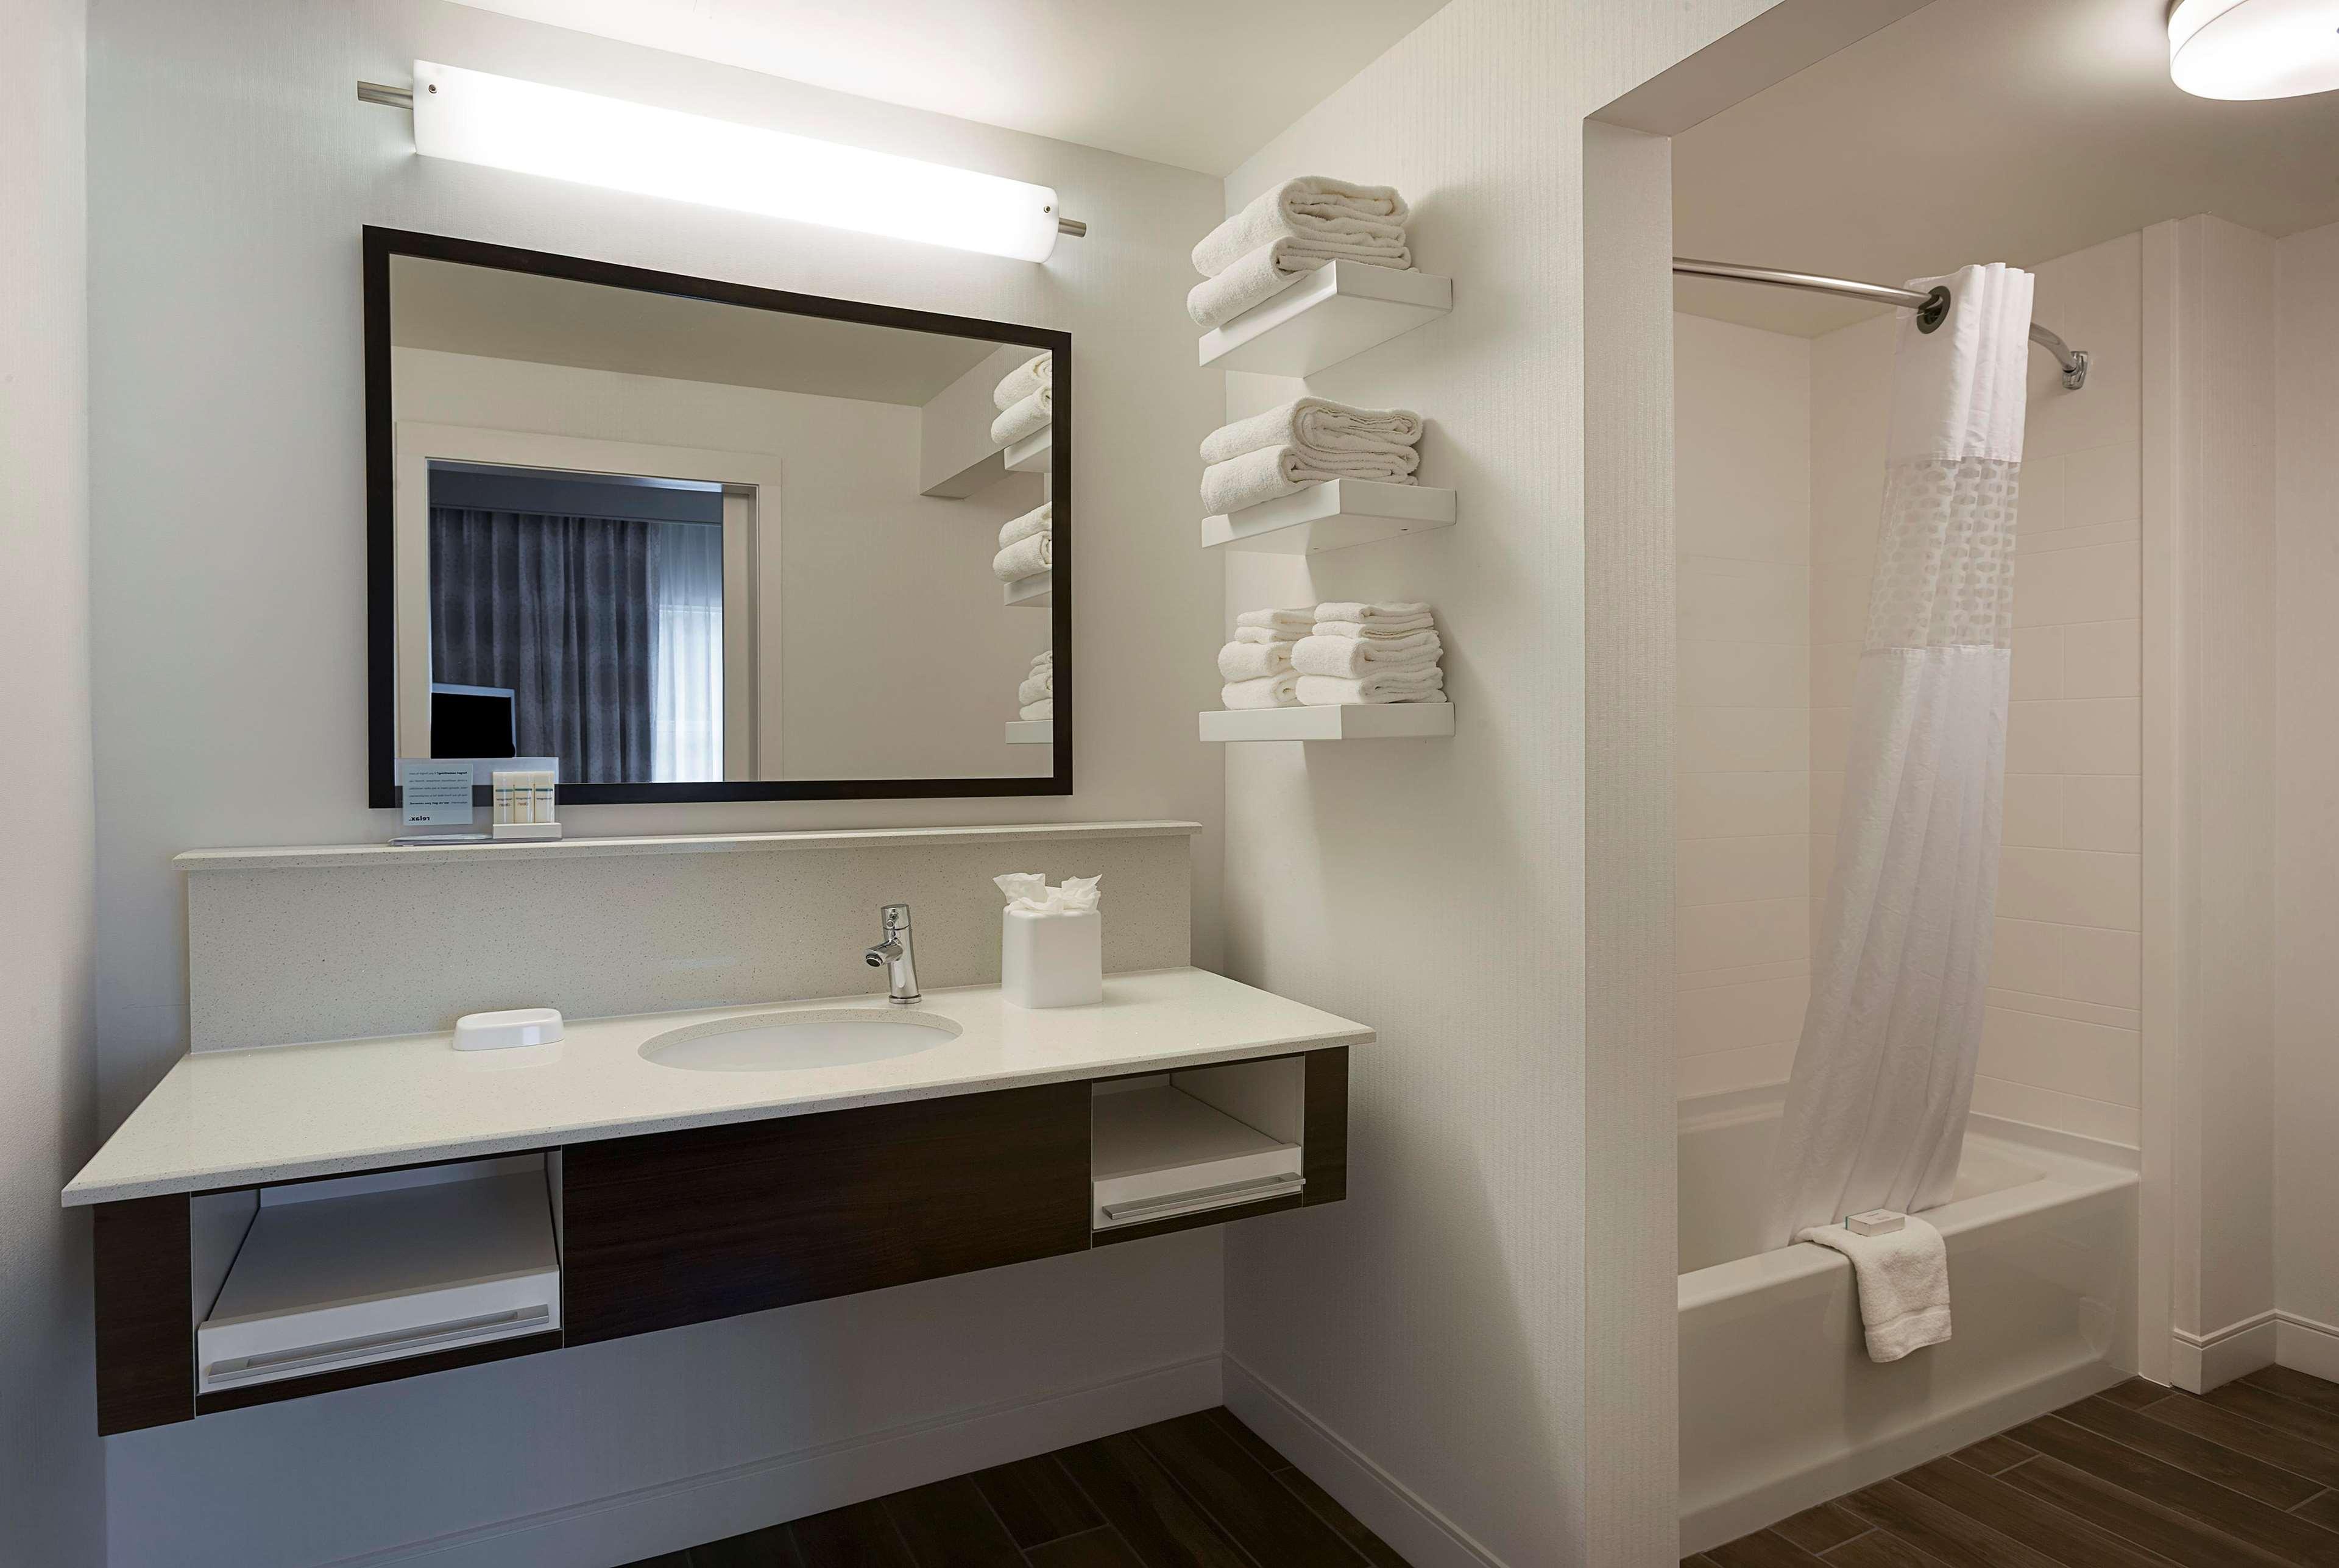 Hampton Inn & Suites Charlotte/Pineville image 21